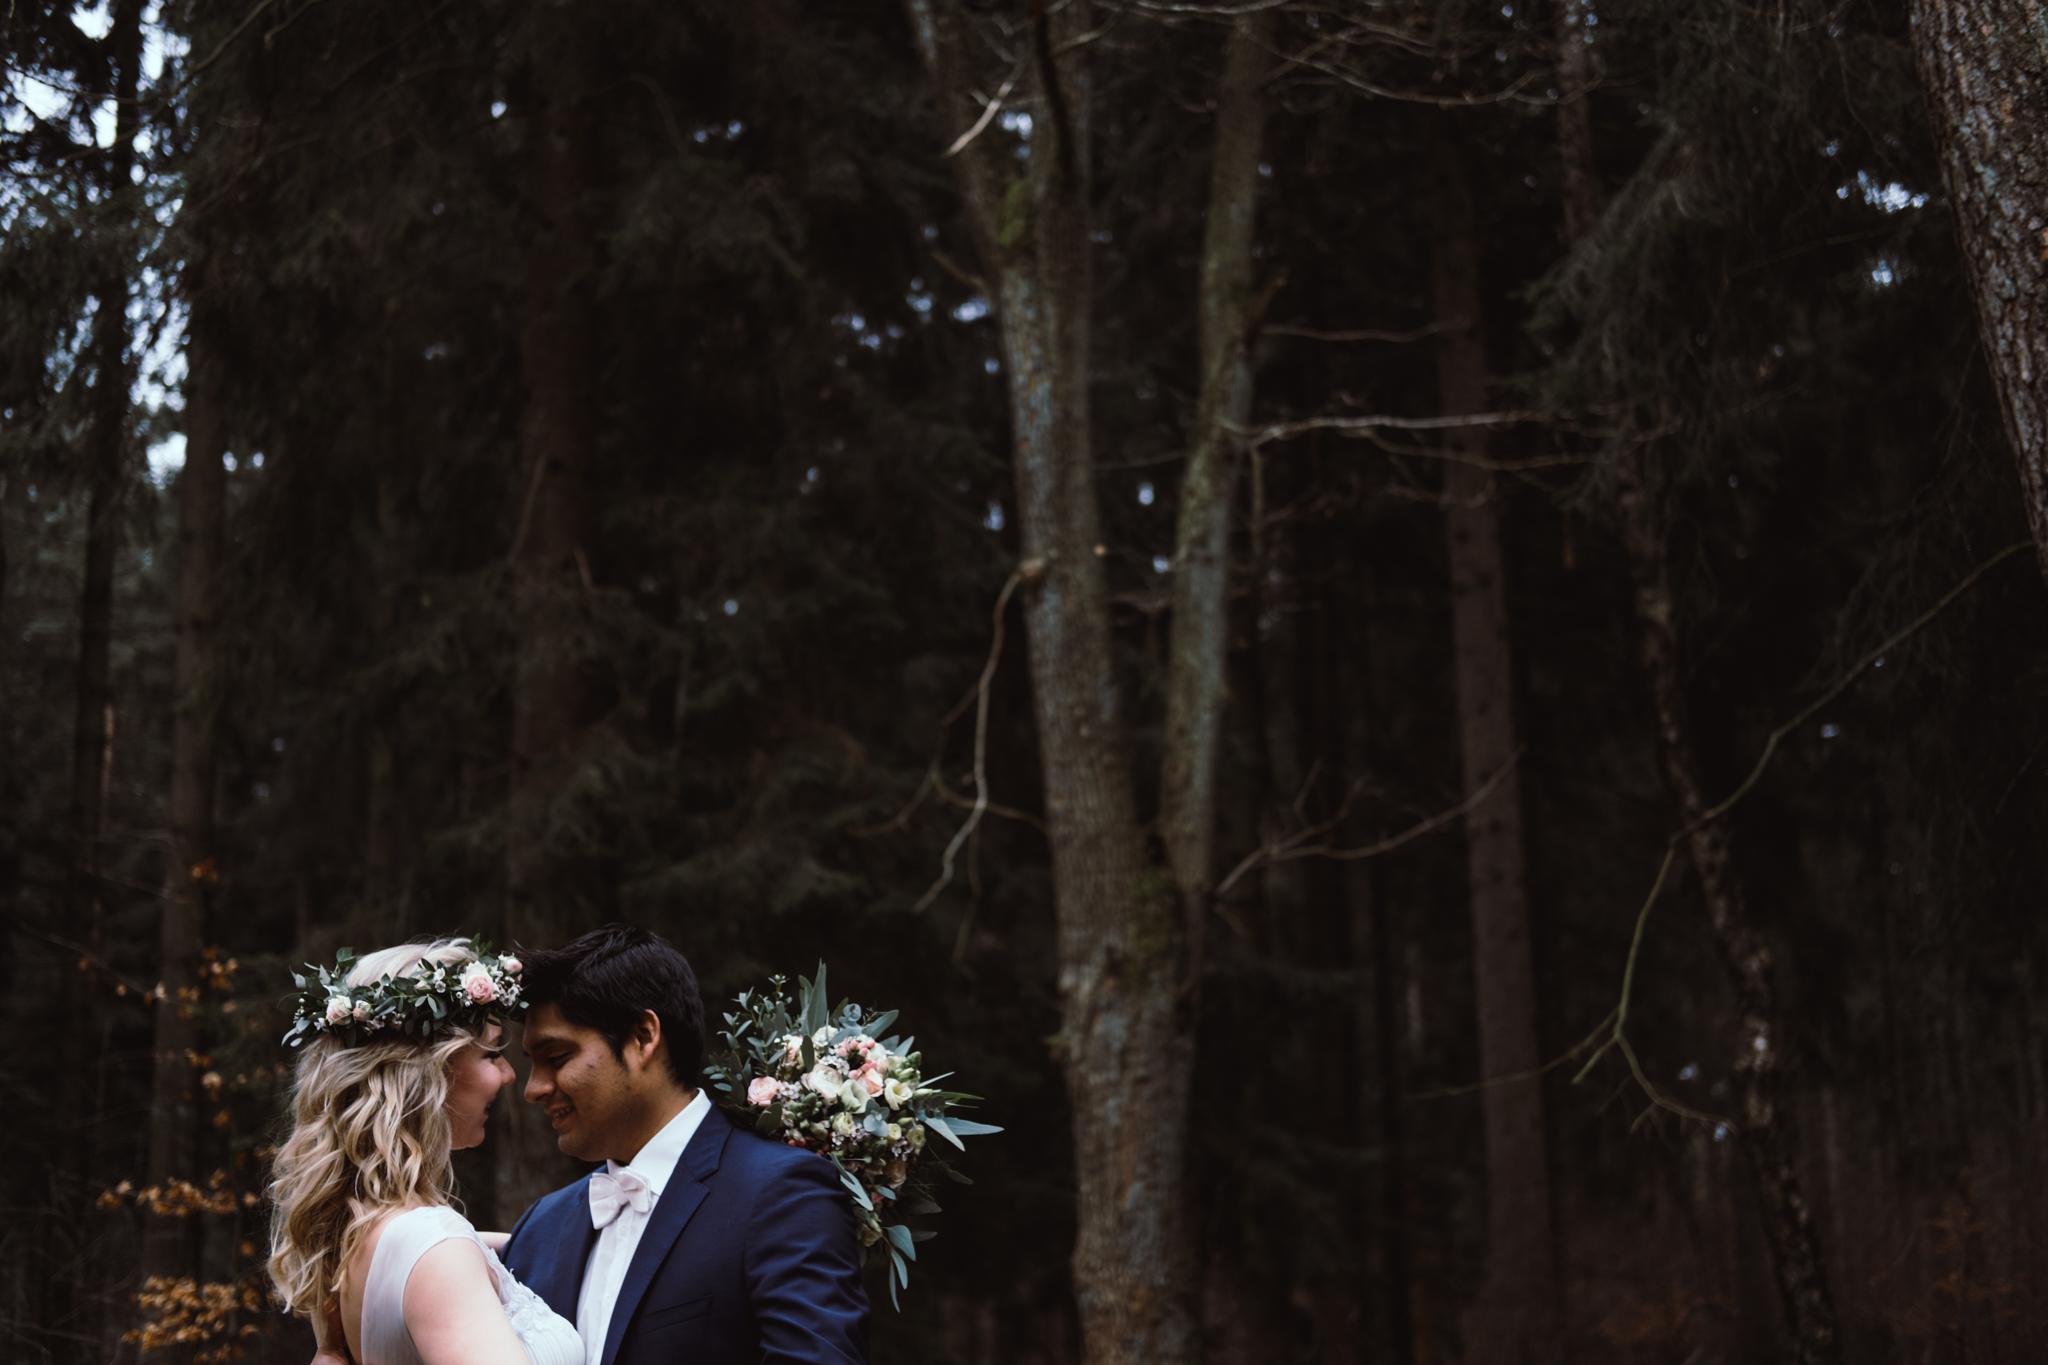 Brautpaar nah Arm in Arm Wald